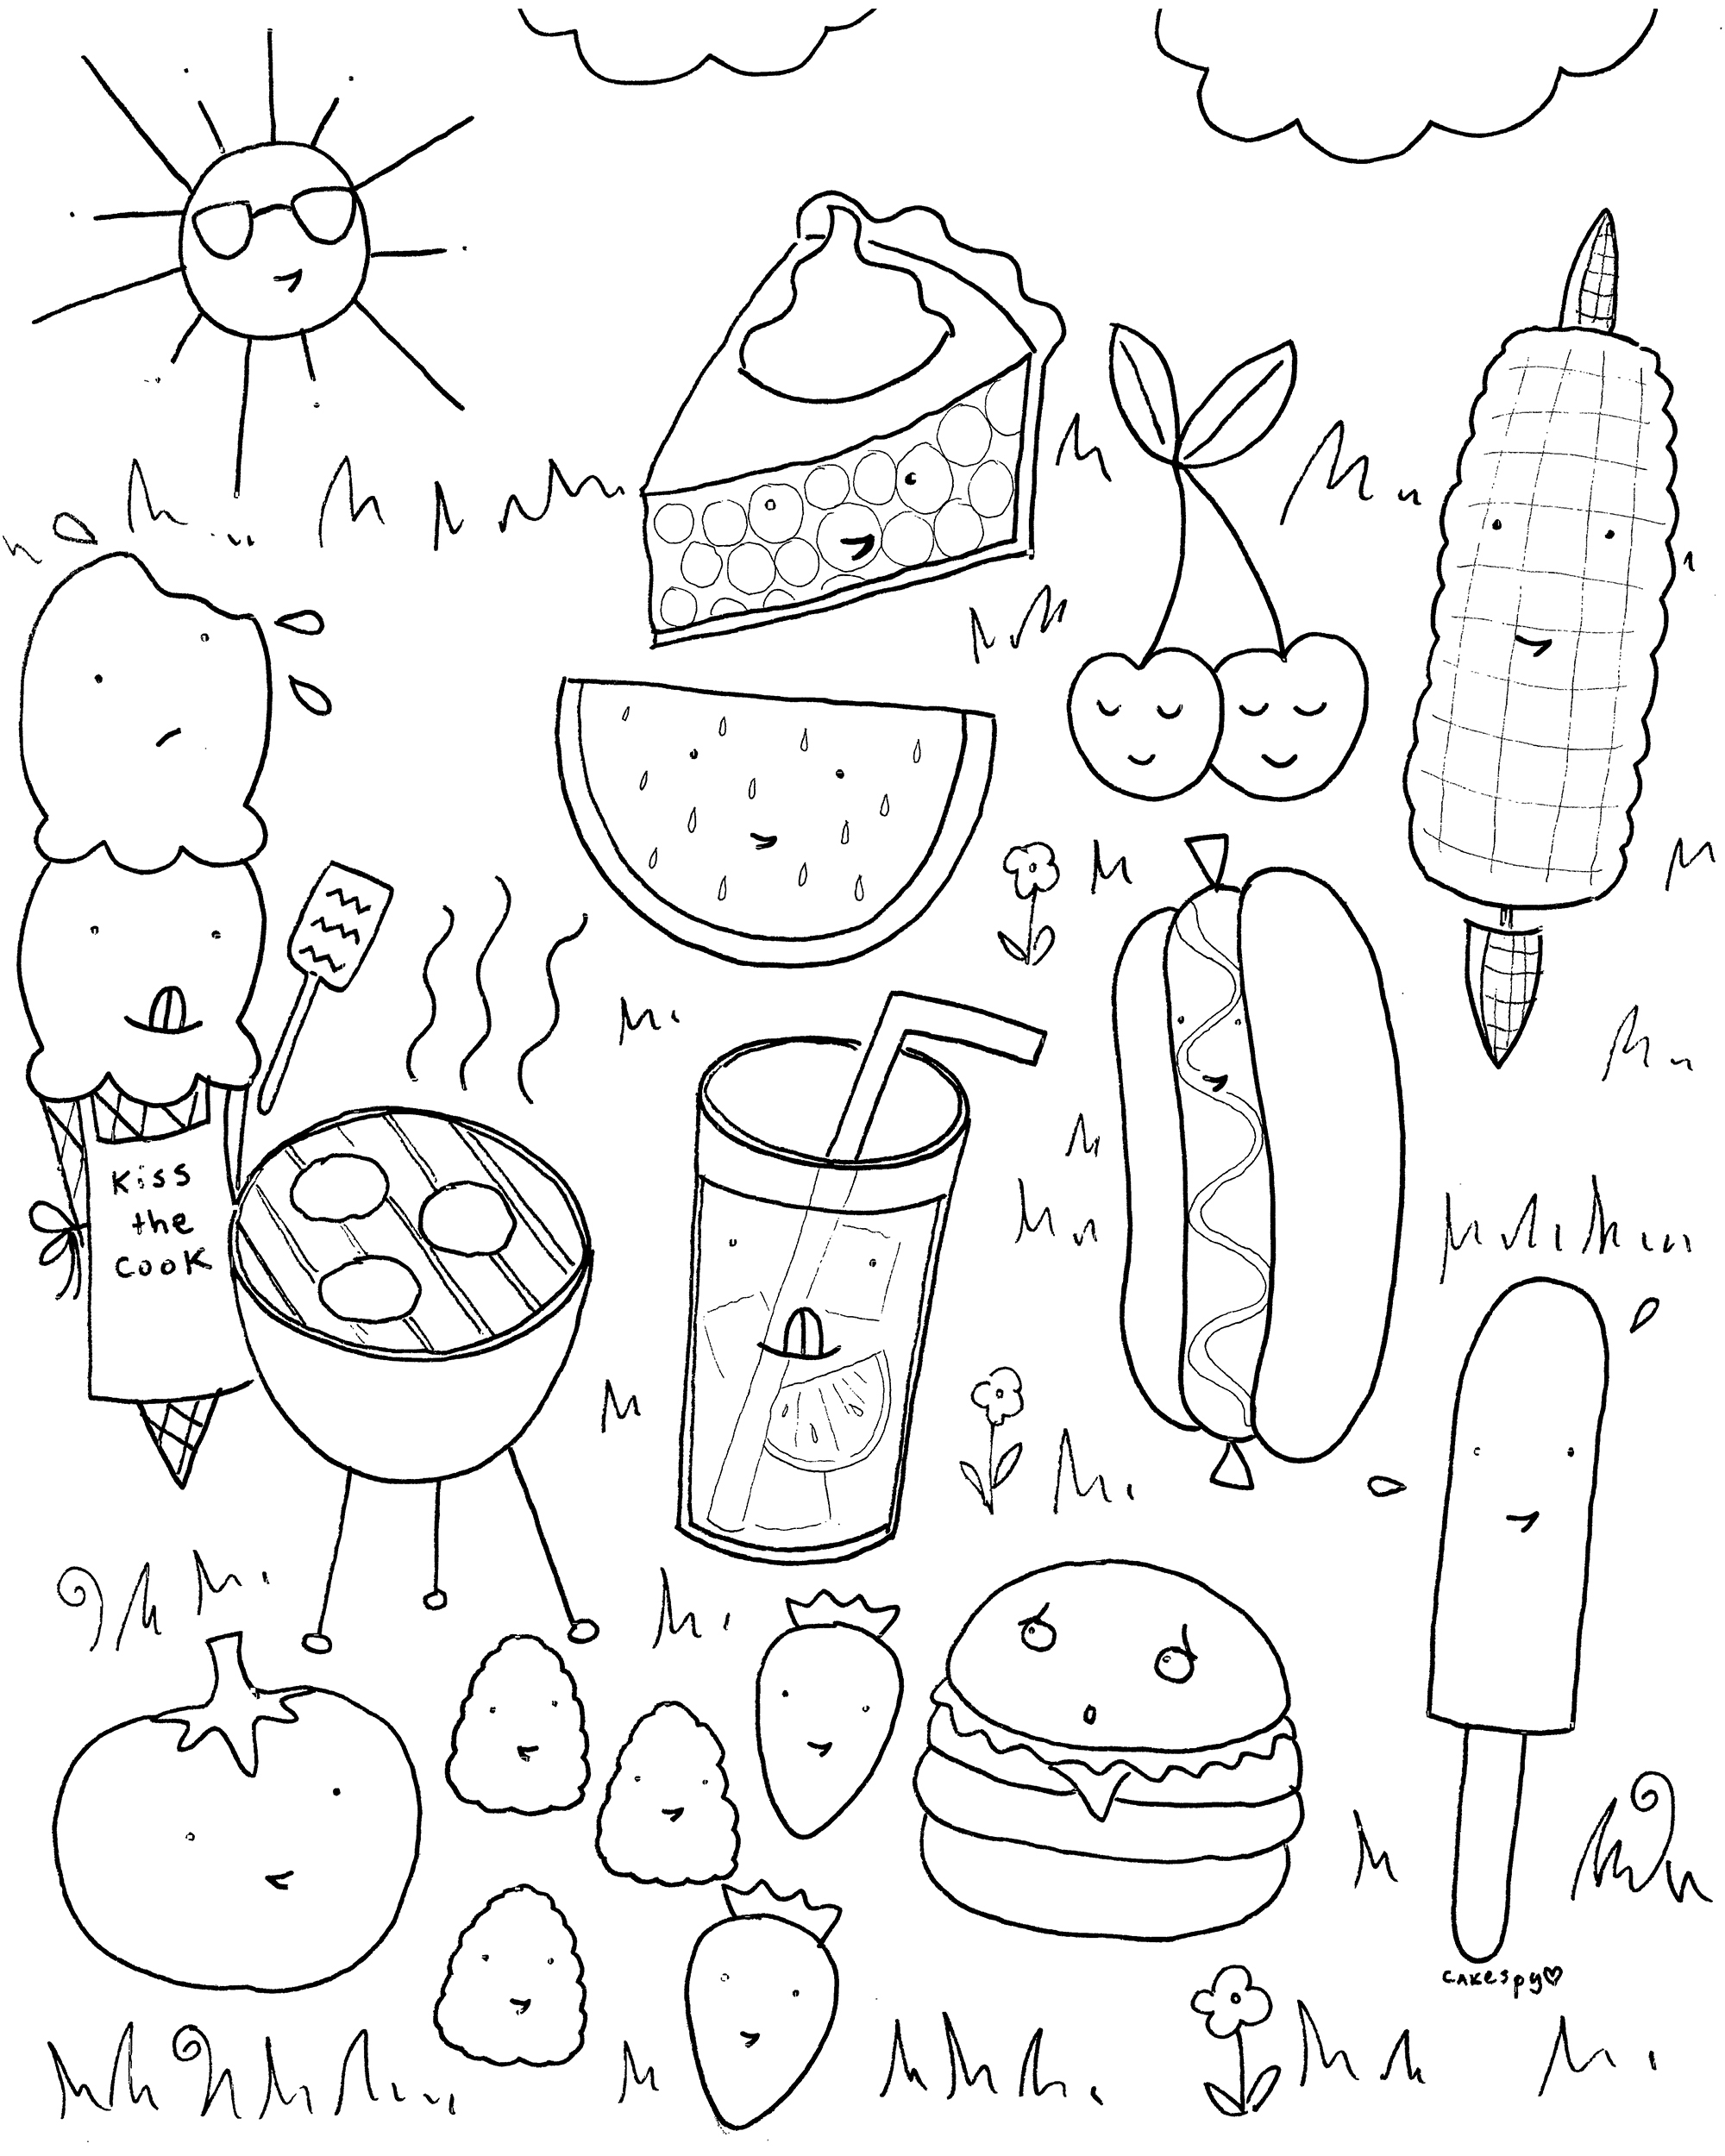 2000x2500 New Printable Summer Coloring Pages For Older Kids Downloadtarget